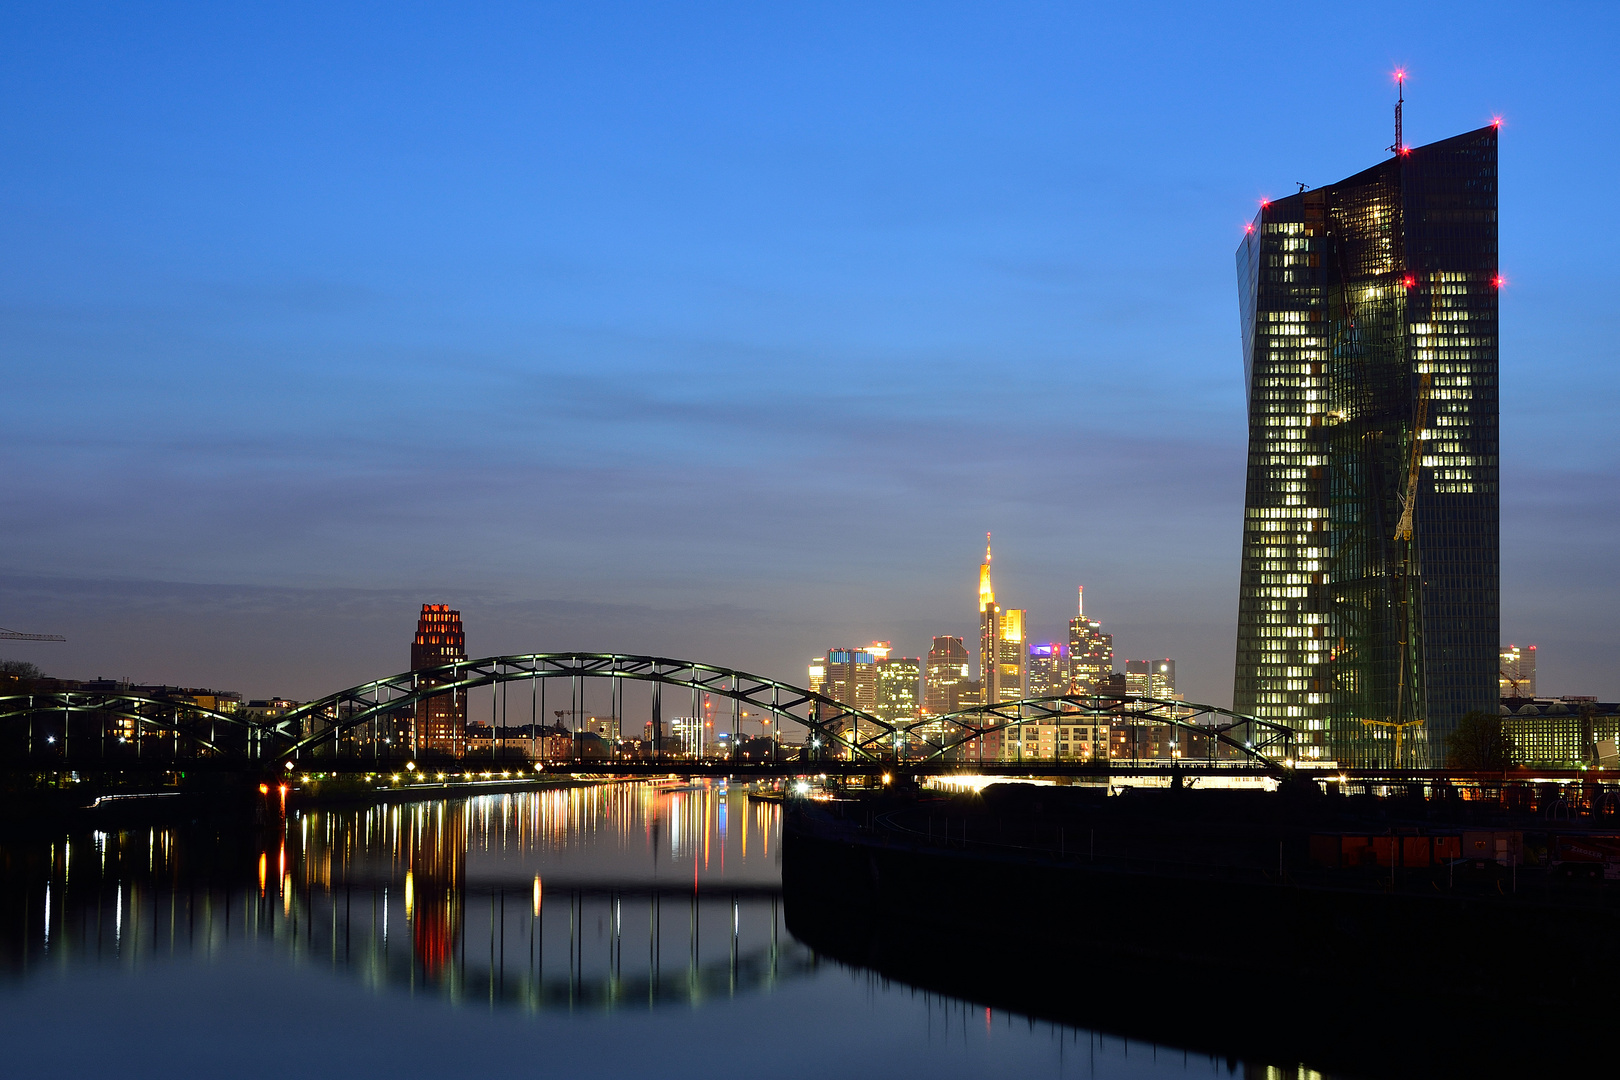 EZB + Skyline